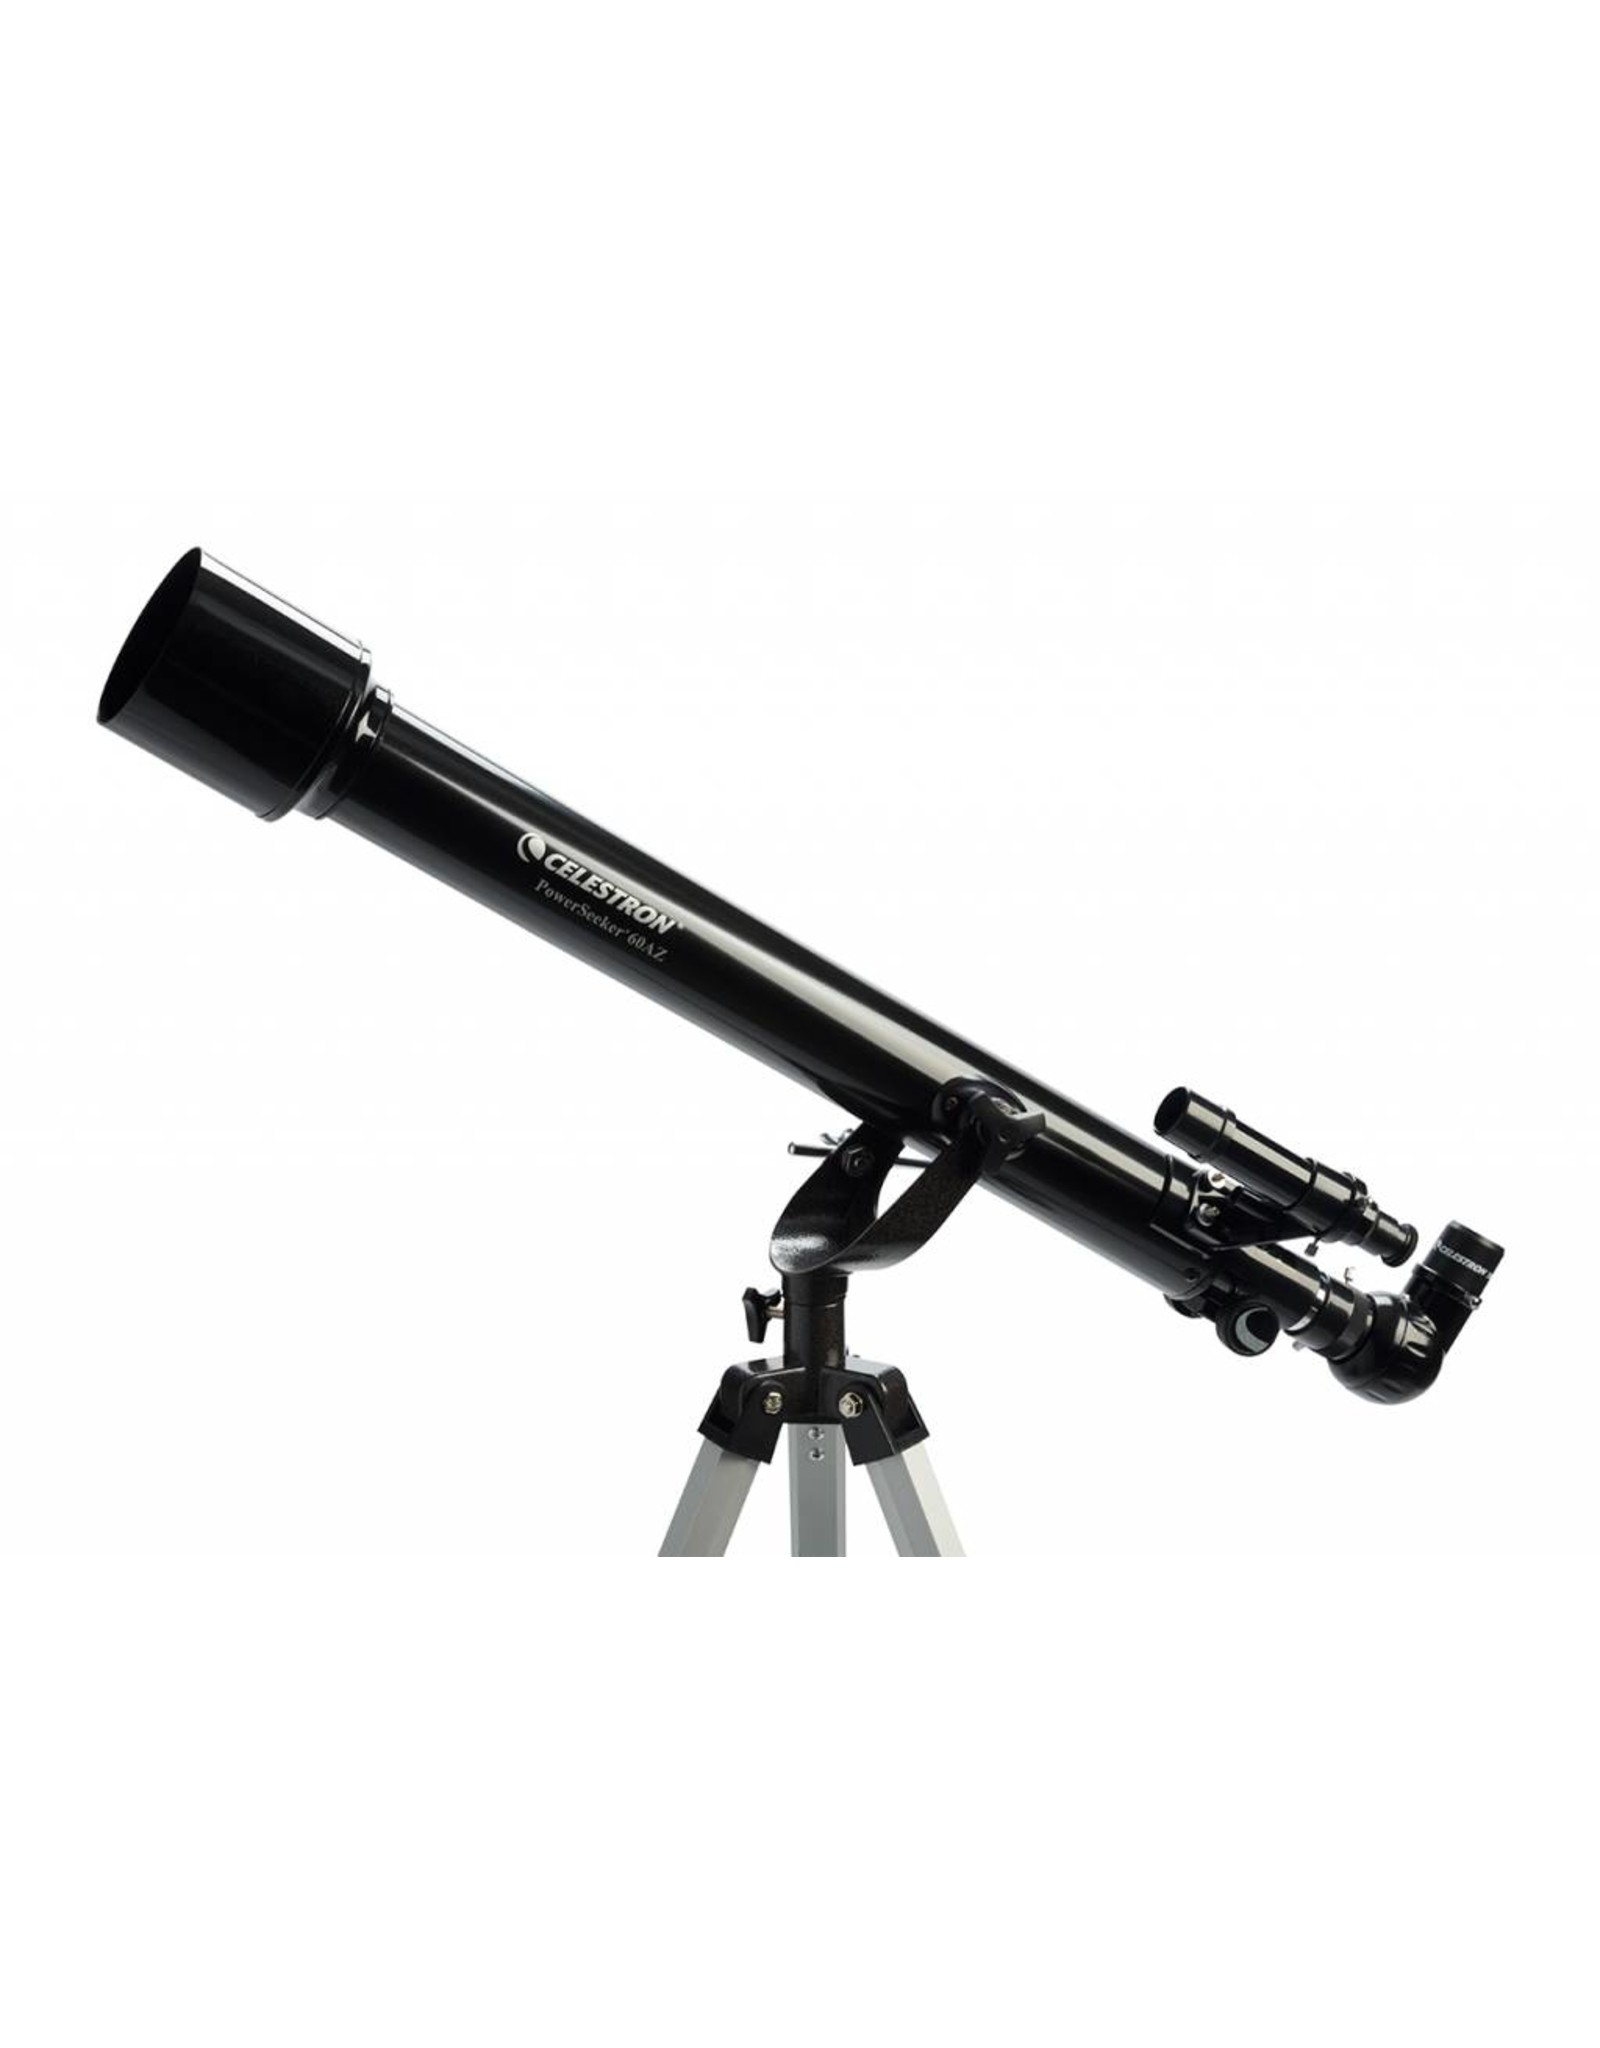 Celestron Celestron PowerSeeker 60AZ Telescope